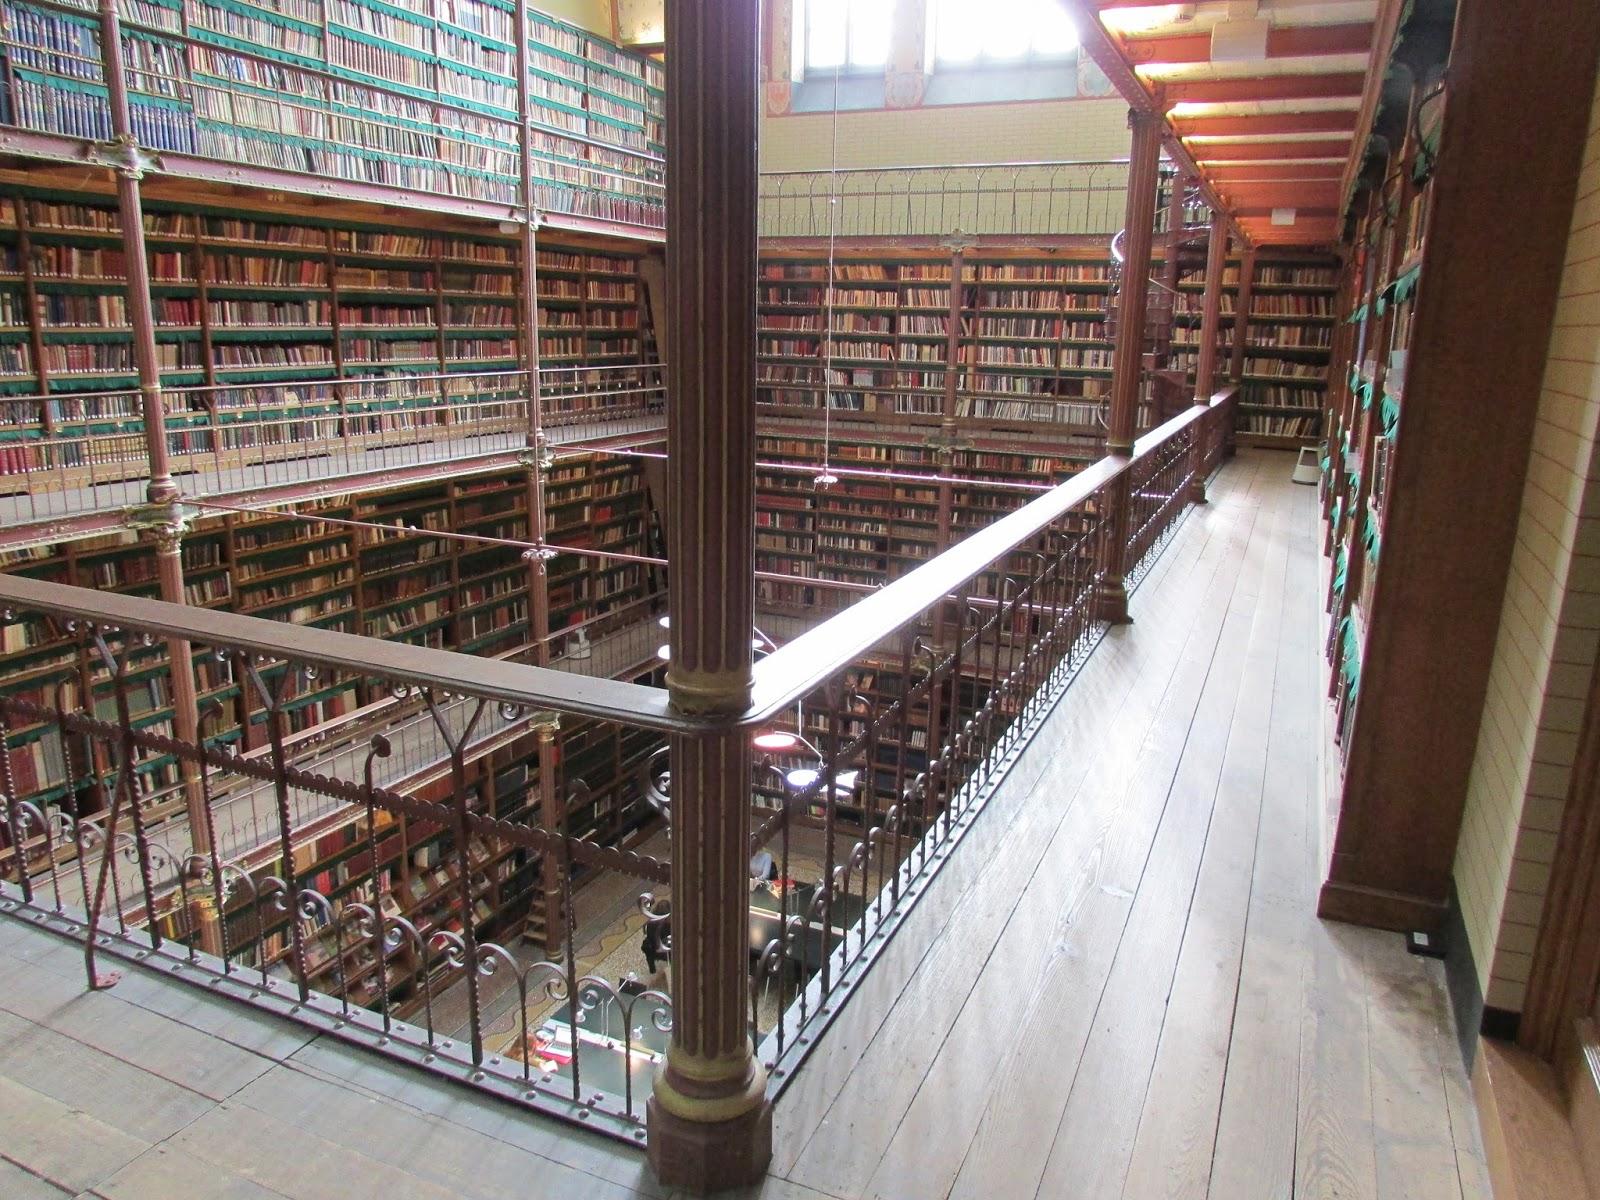 Library, Rijksmuseum - Amsterdam